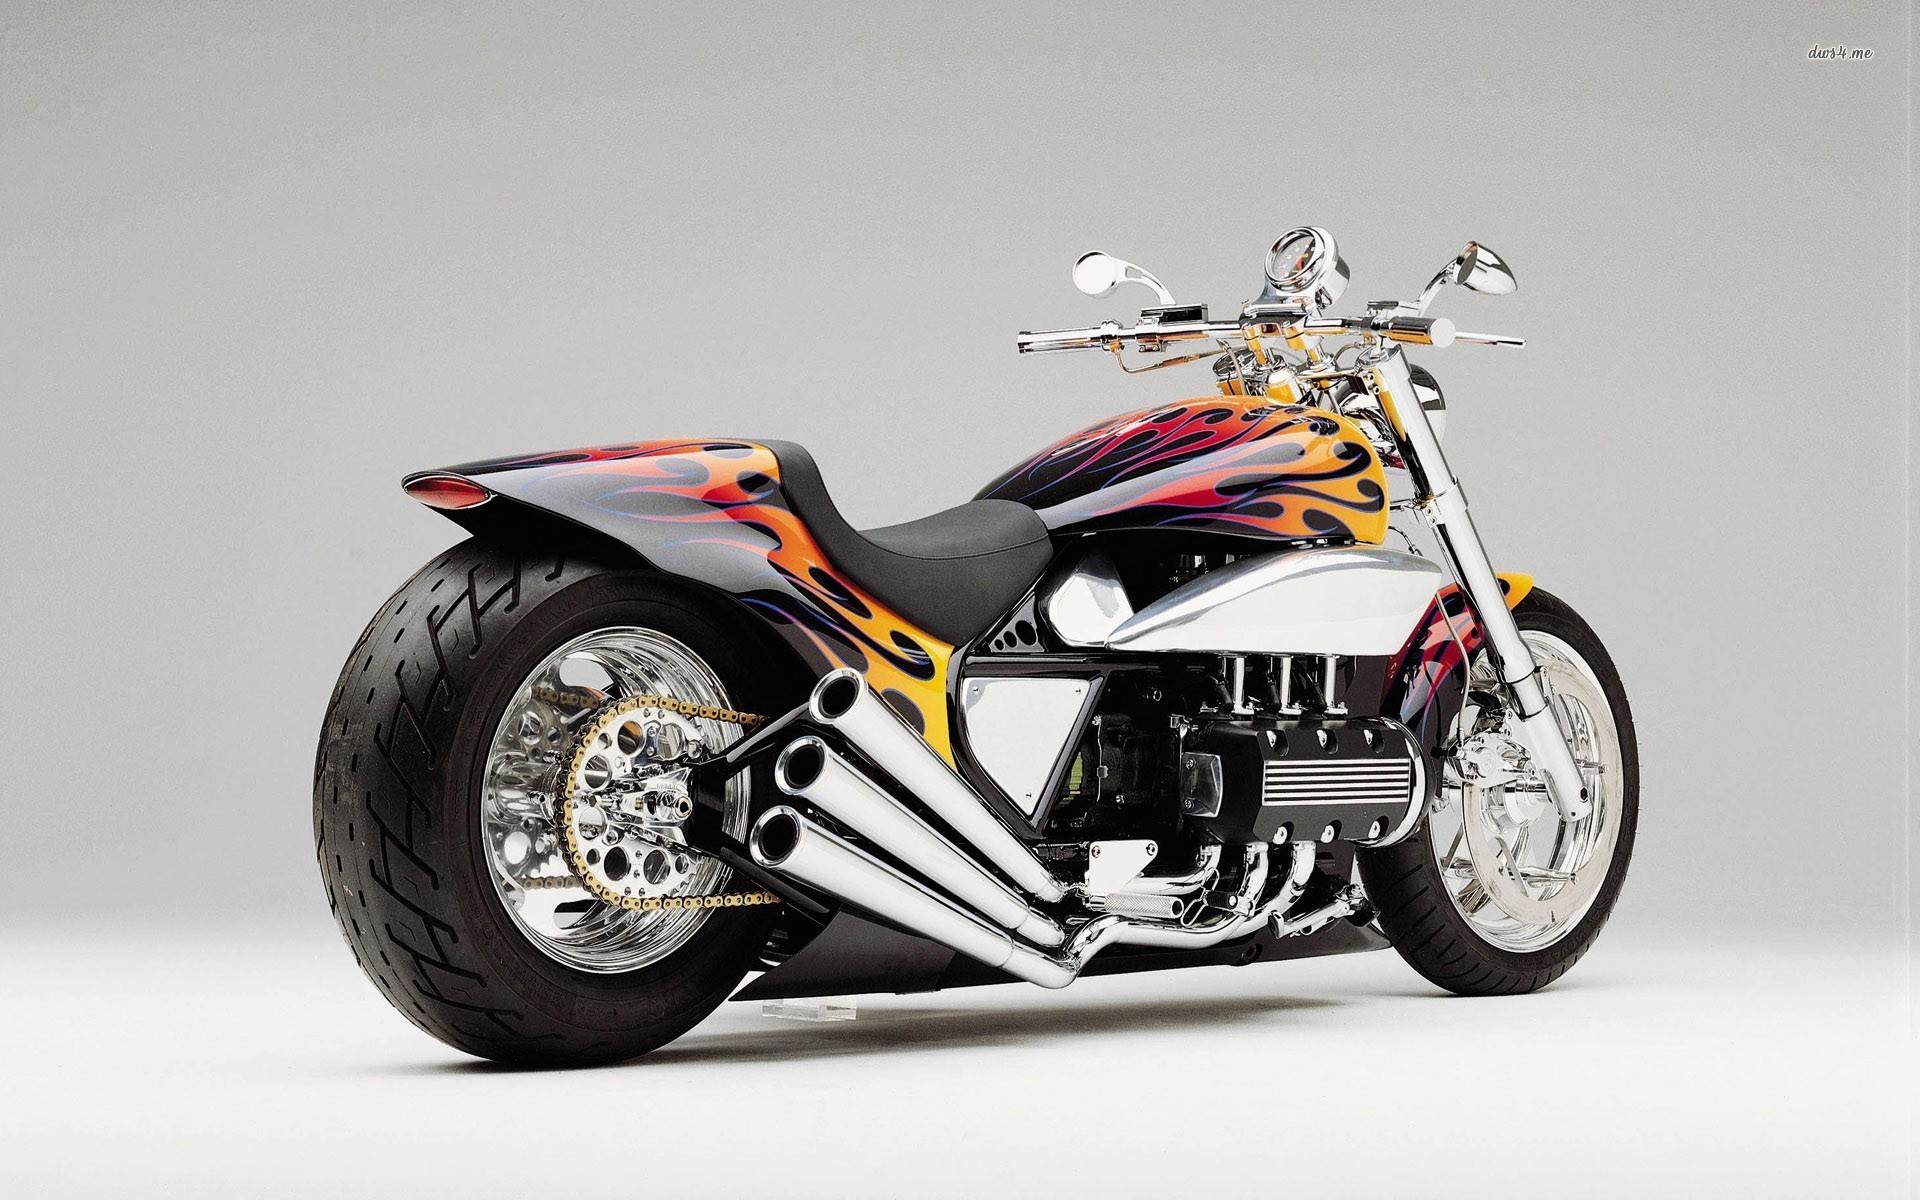 7871 honda t3 chopper 1920x1200 motorcycle wallpaper 1920x1200